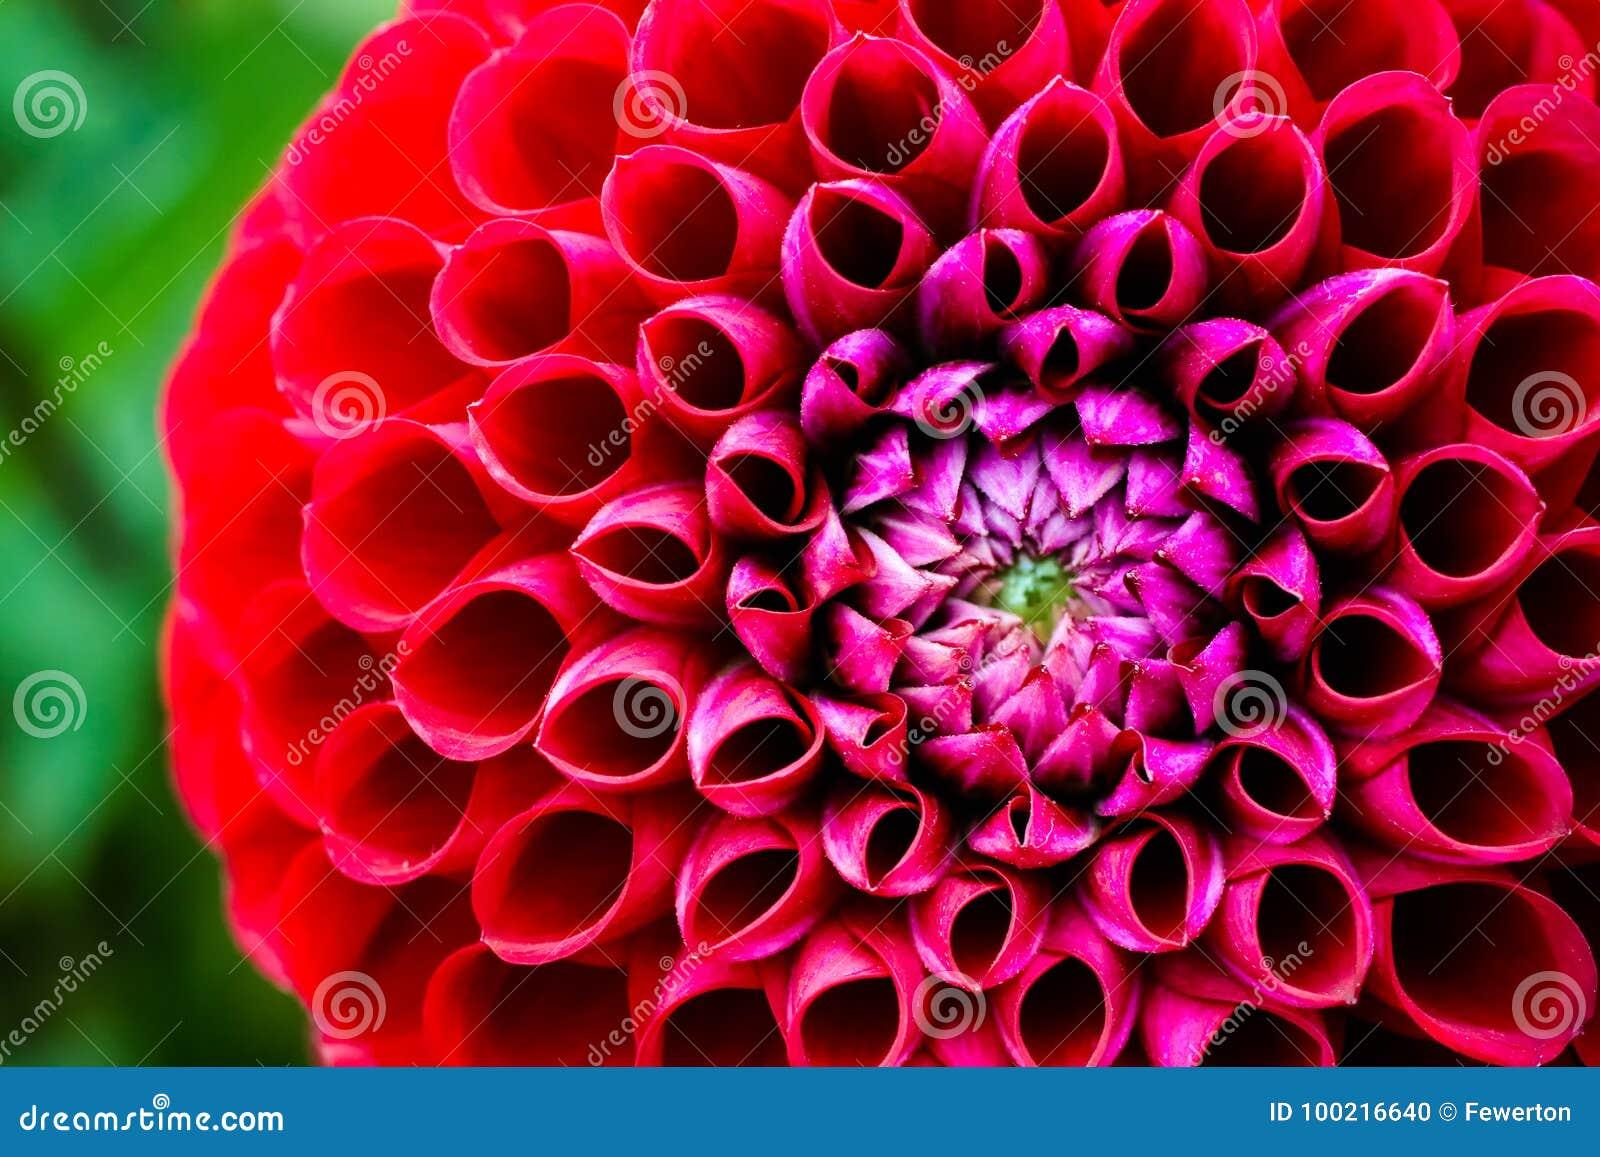 Red Dahlia Flower Stock Photo Image Of Ball Light 100216640